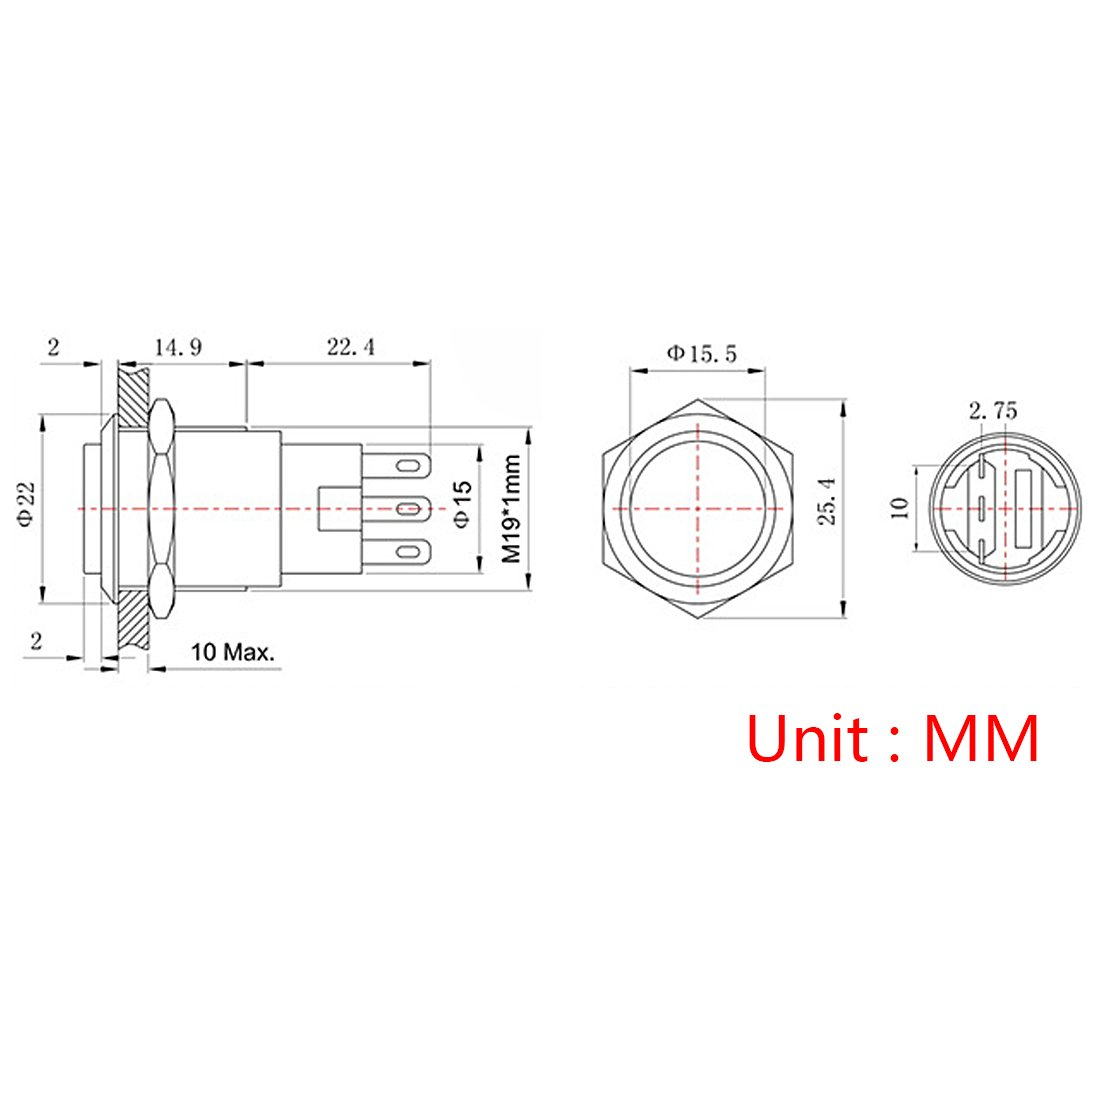 Andux Land Metal Push Button Switches 19mm High Head Momentary 5pcs JSANKG-06